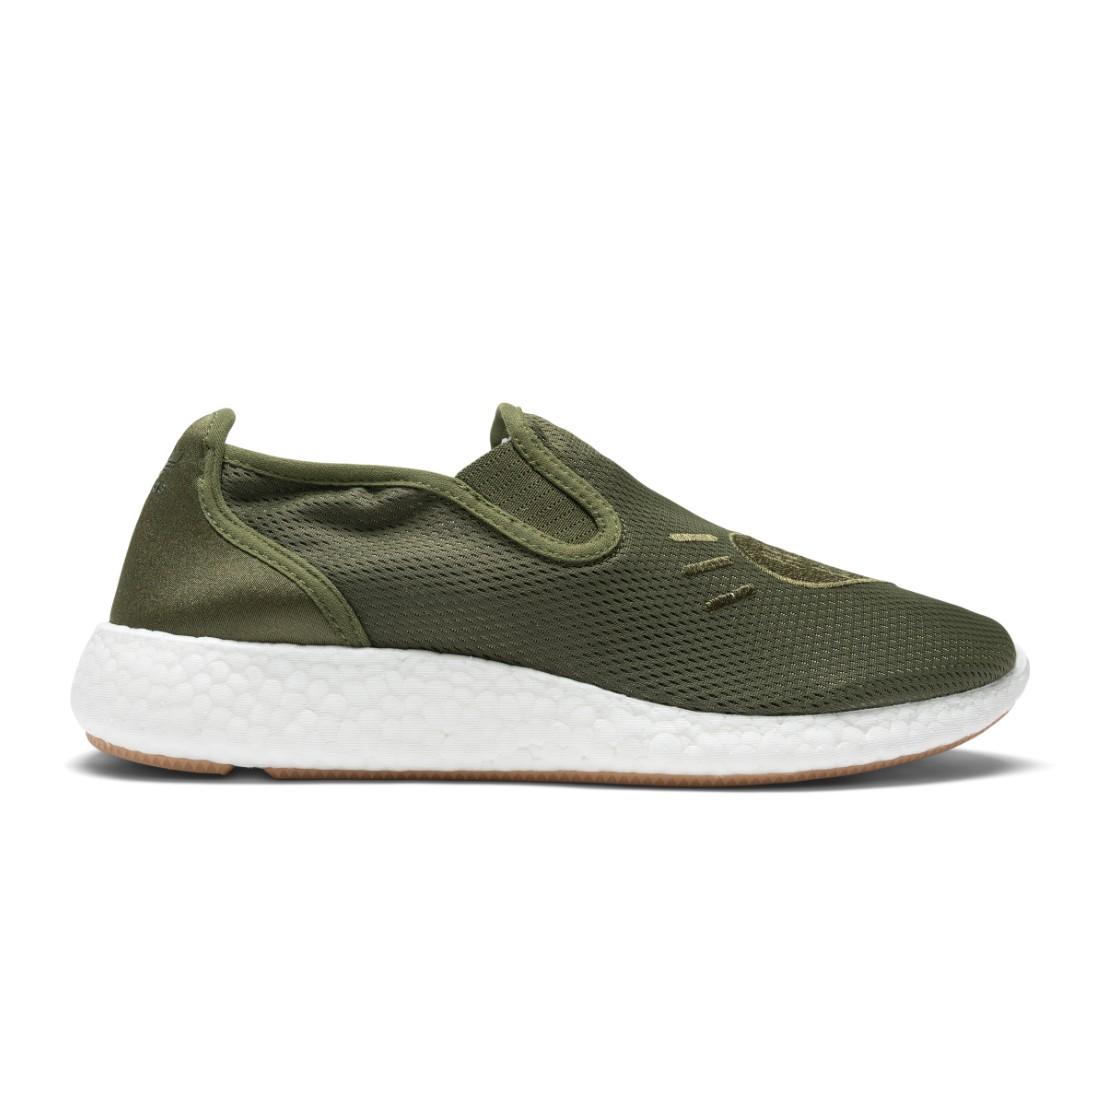 Adidas x Human Made Men Slipon Pure (green / wild pine / core black)